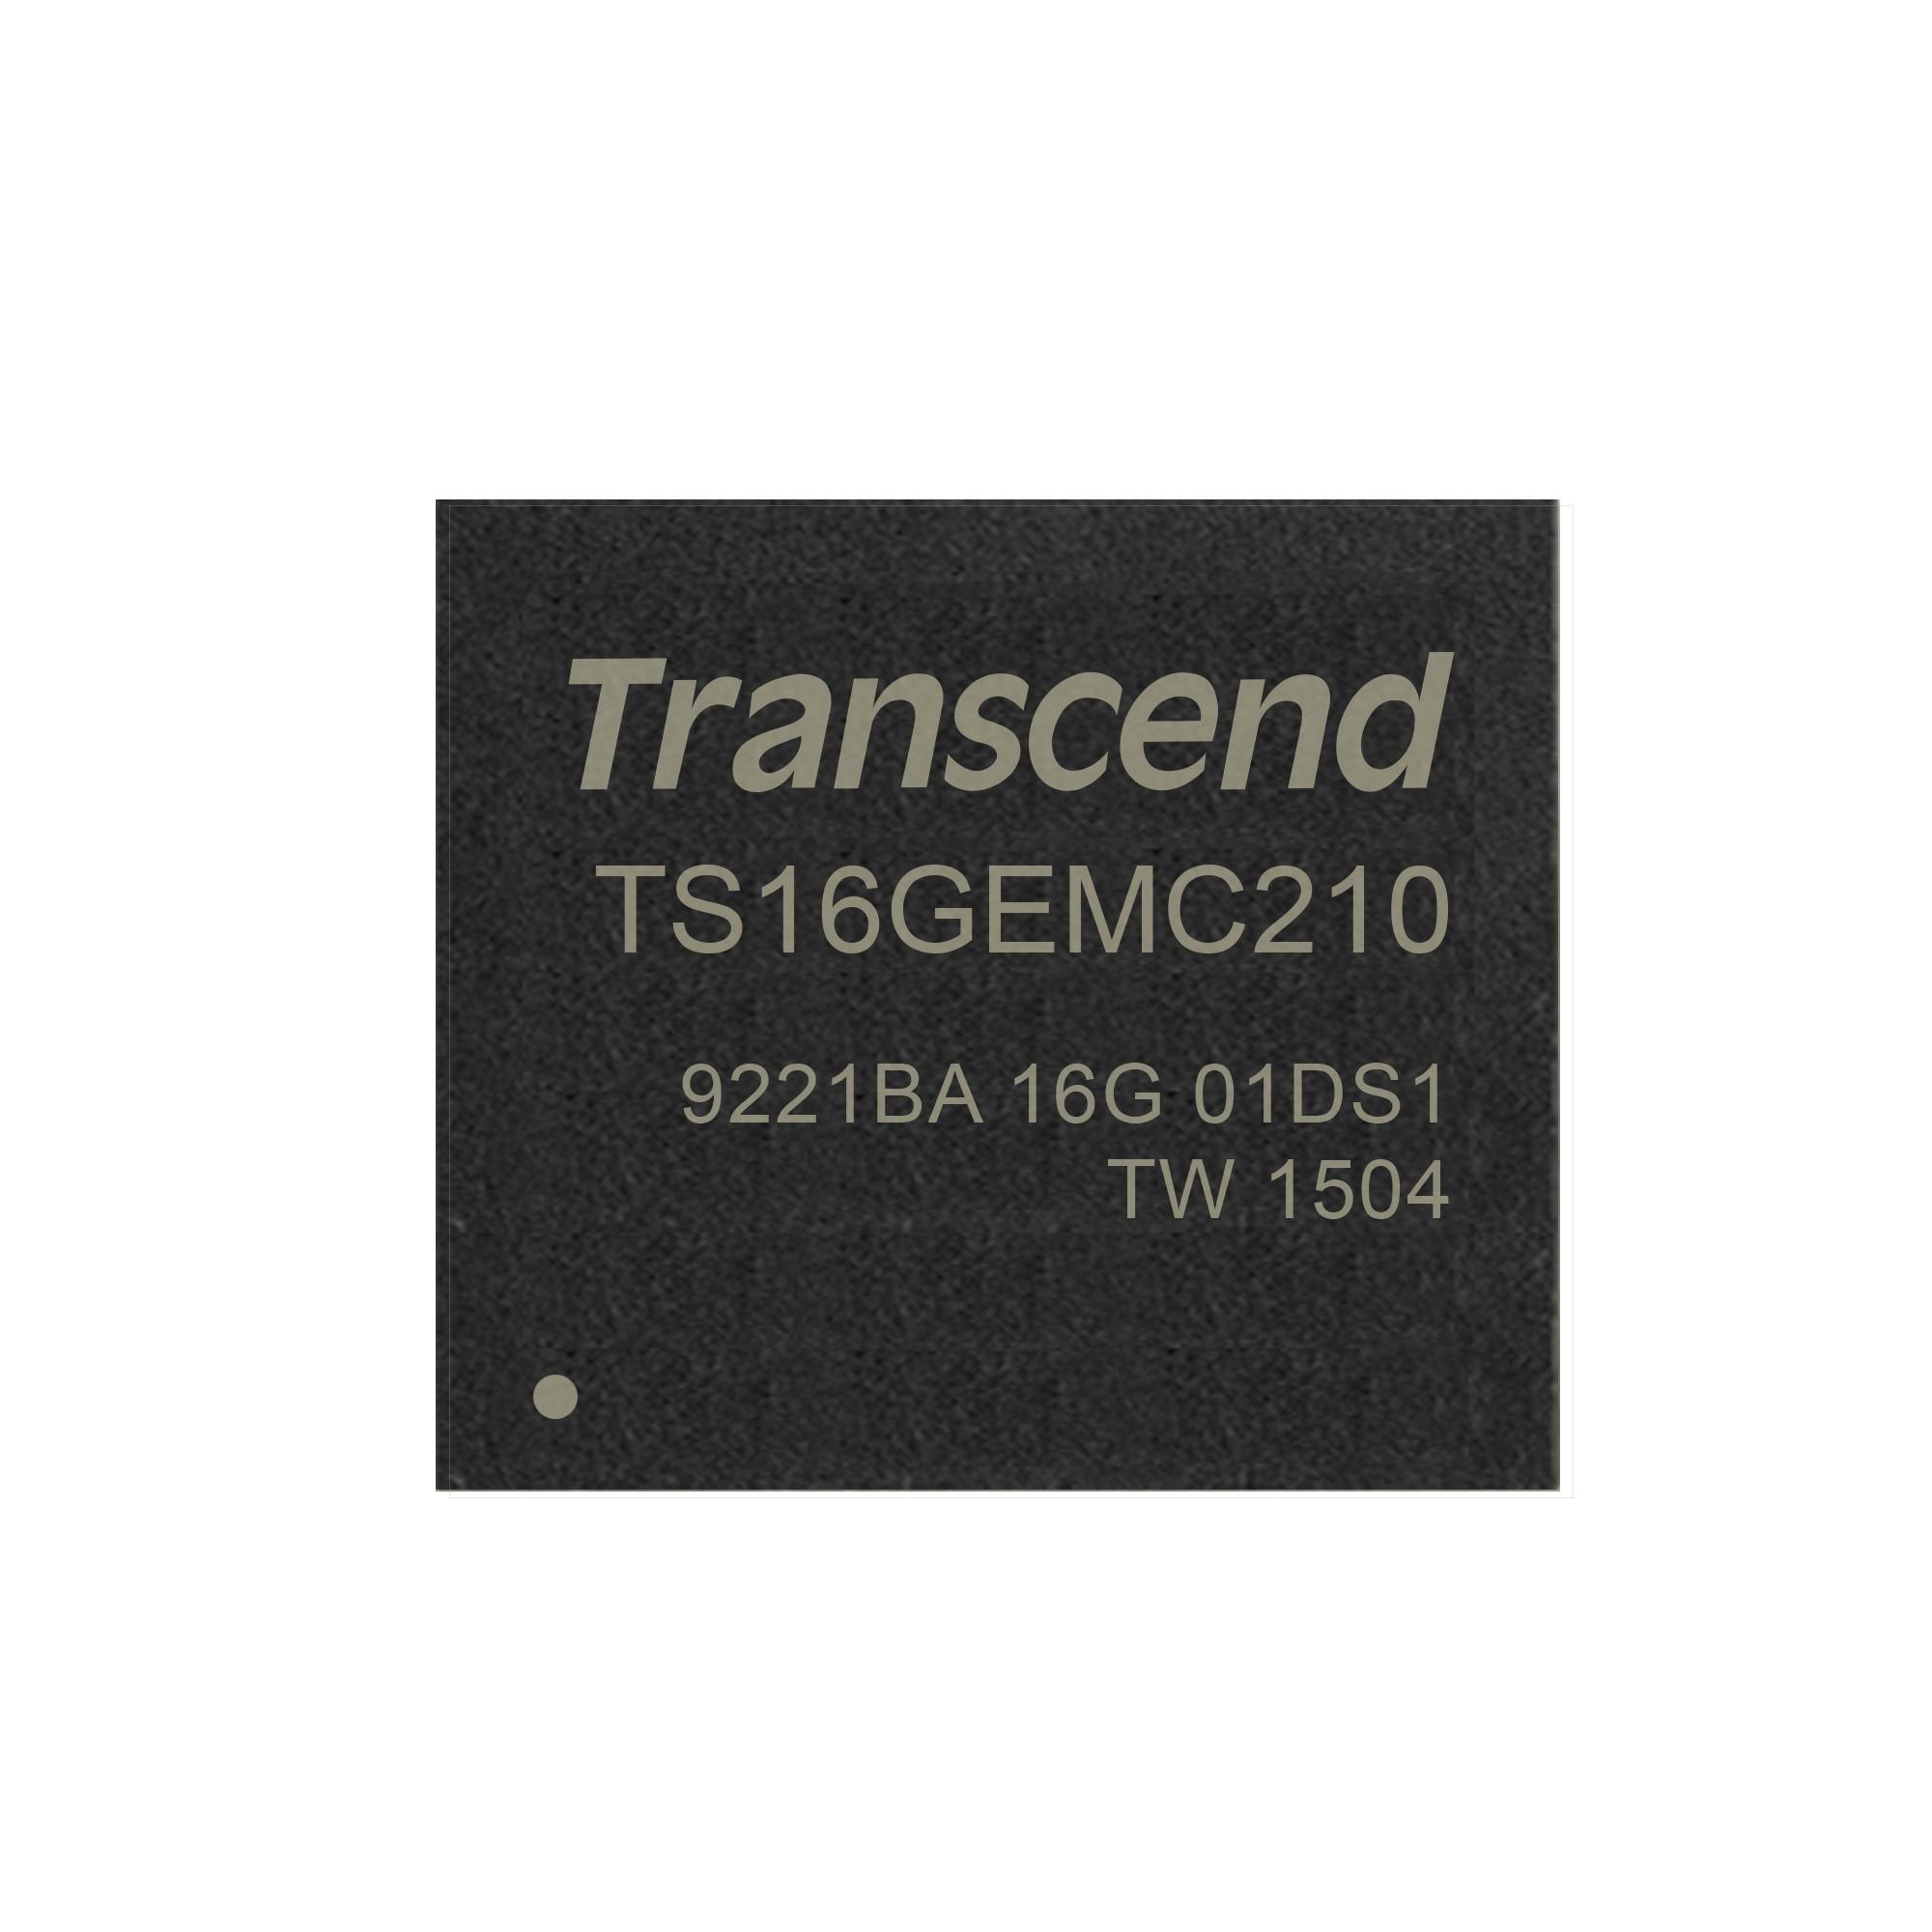 Картка пам'яті Transcend 16GB eMMC (TS16GEMC210)